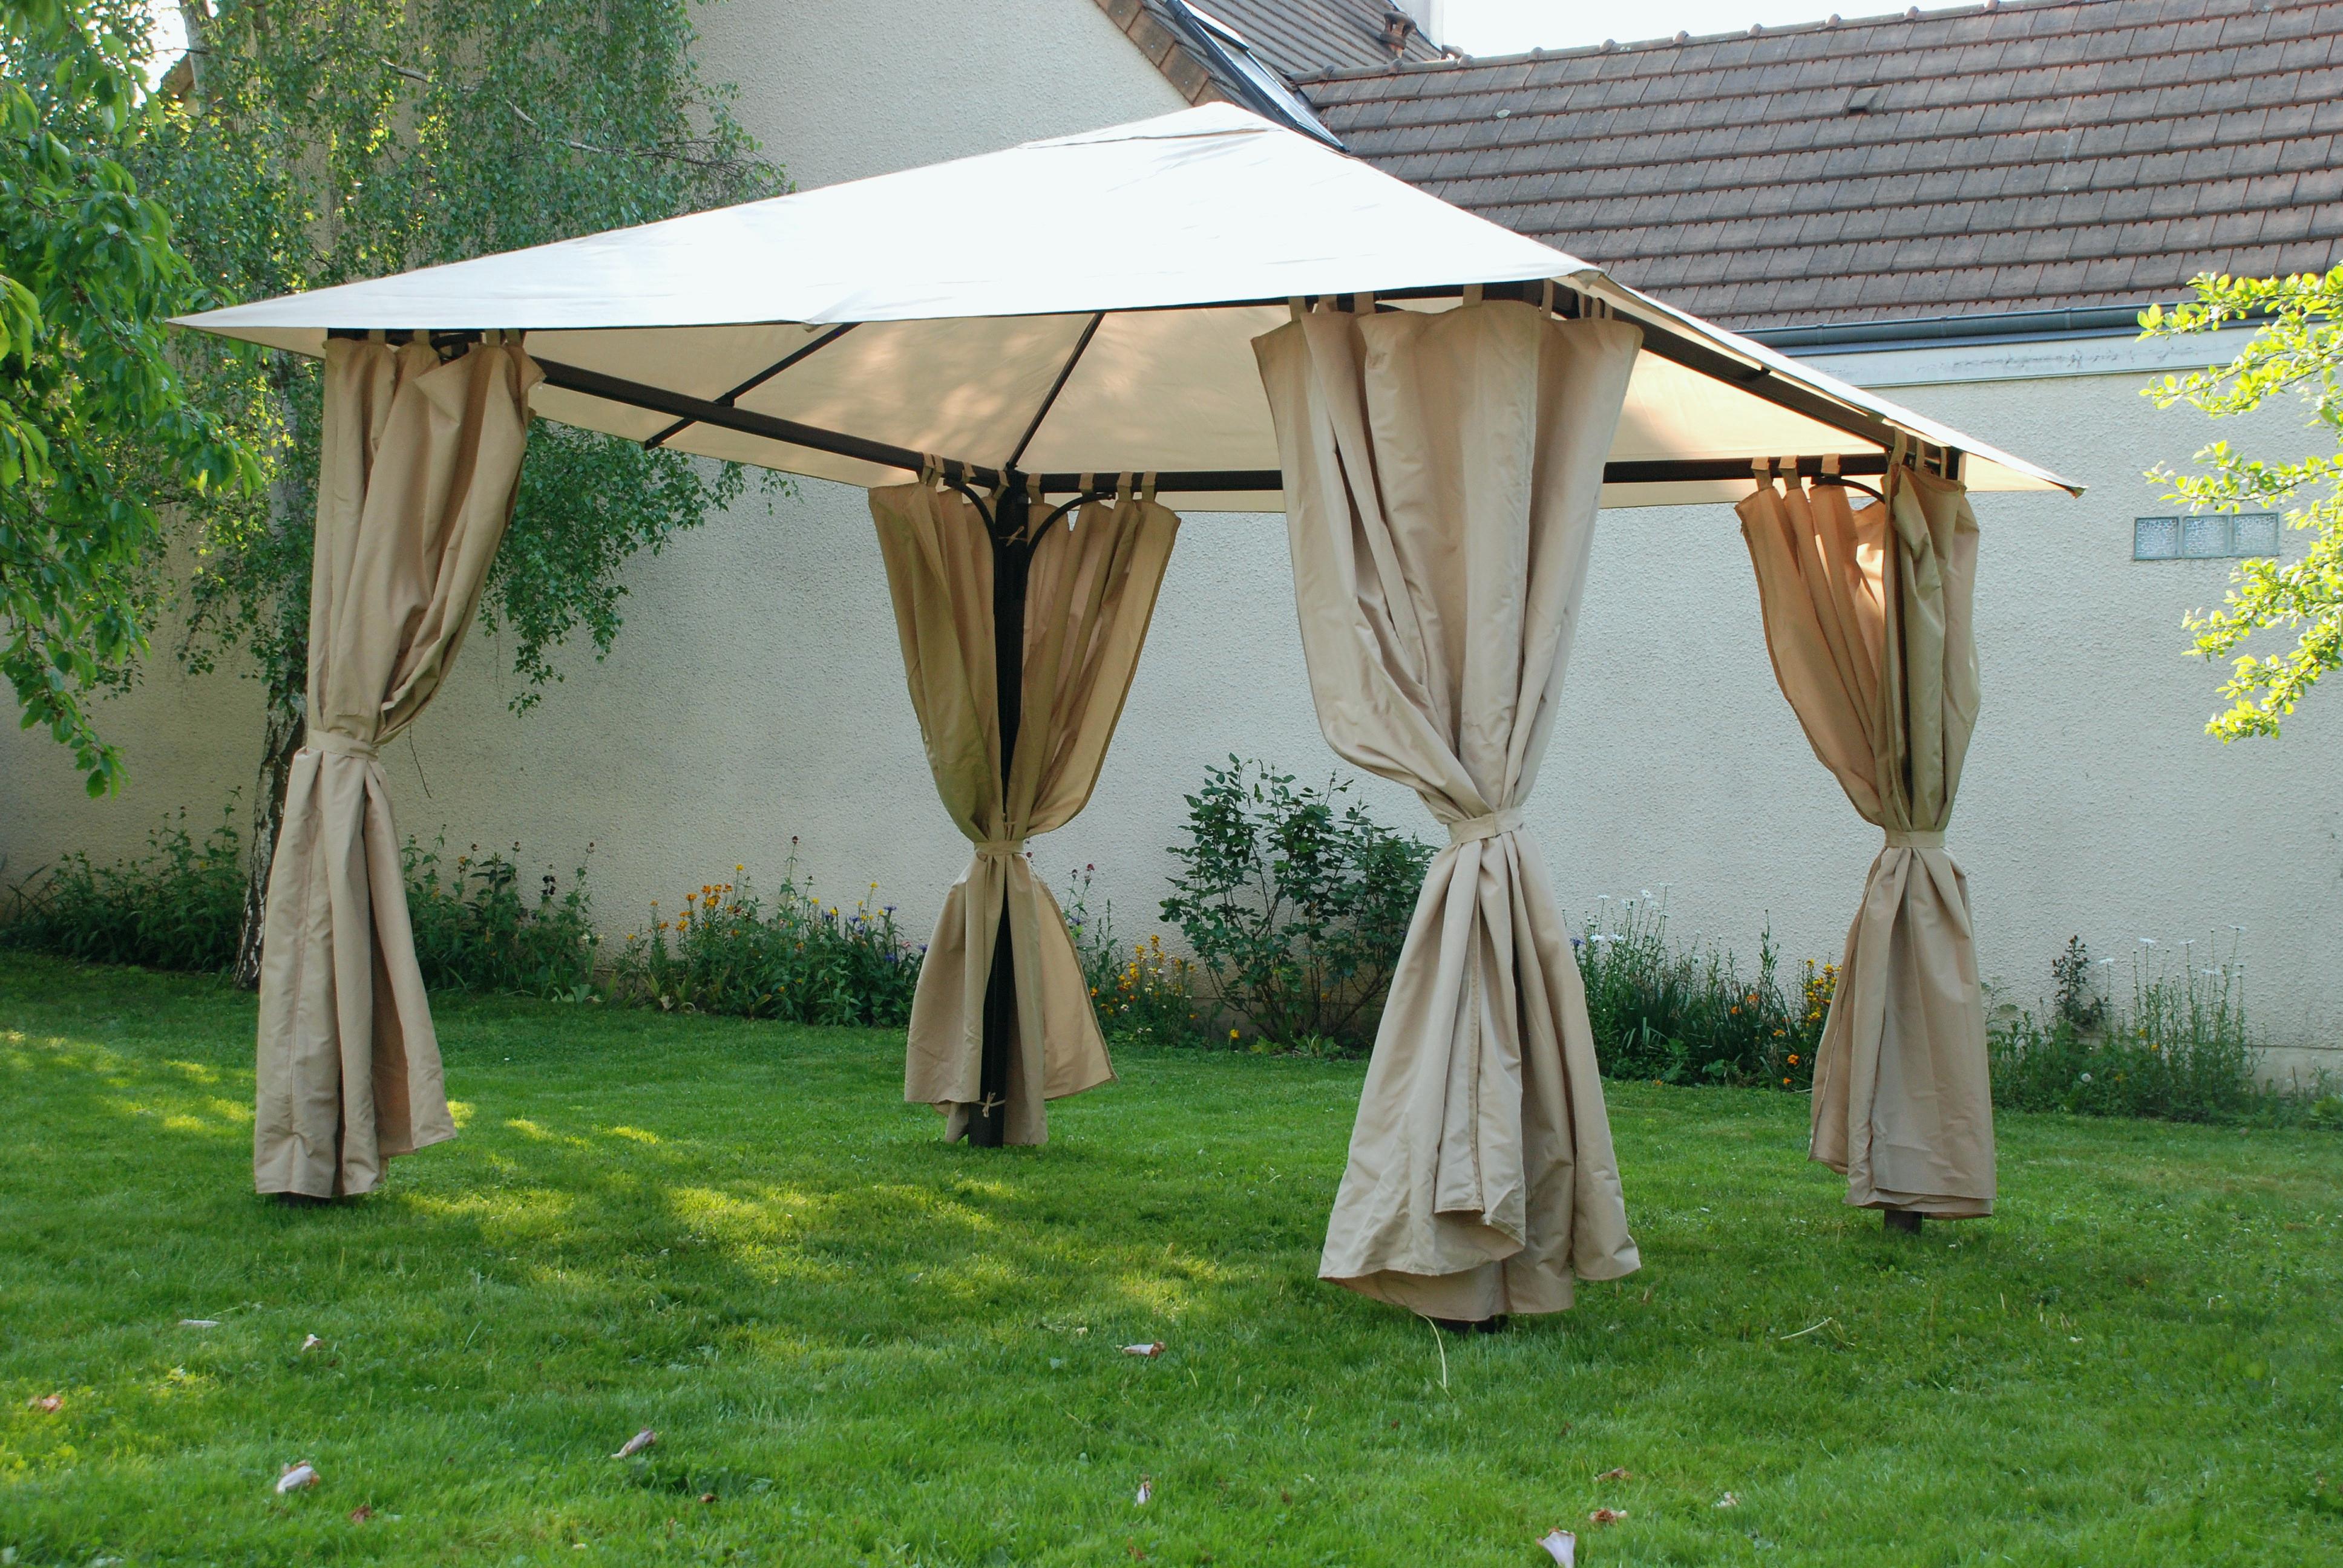 Tente De Reception Brico Depot L Gant Tonnelle Jardin à Tonnelle De Jardin Castorama